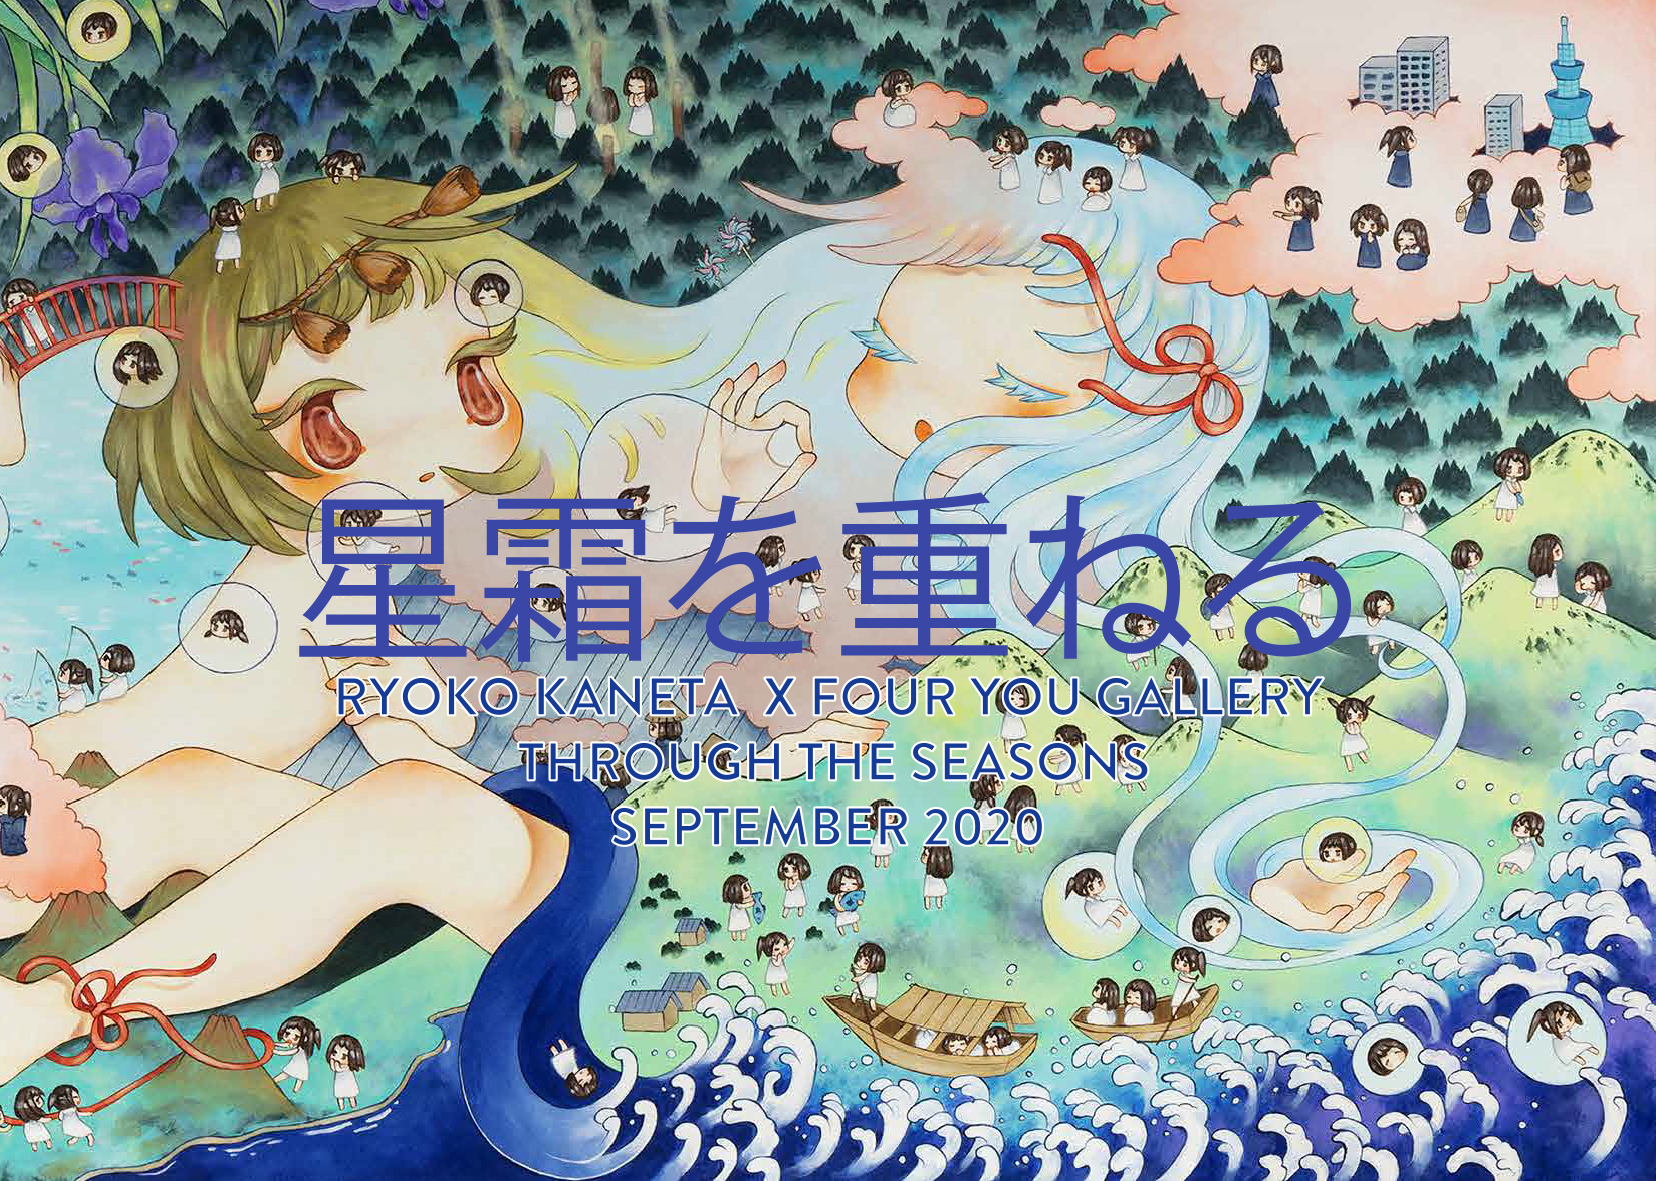 ryoko-kaneta-catalog-1.jpg